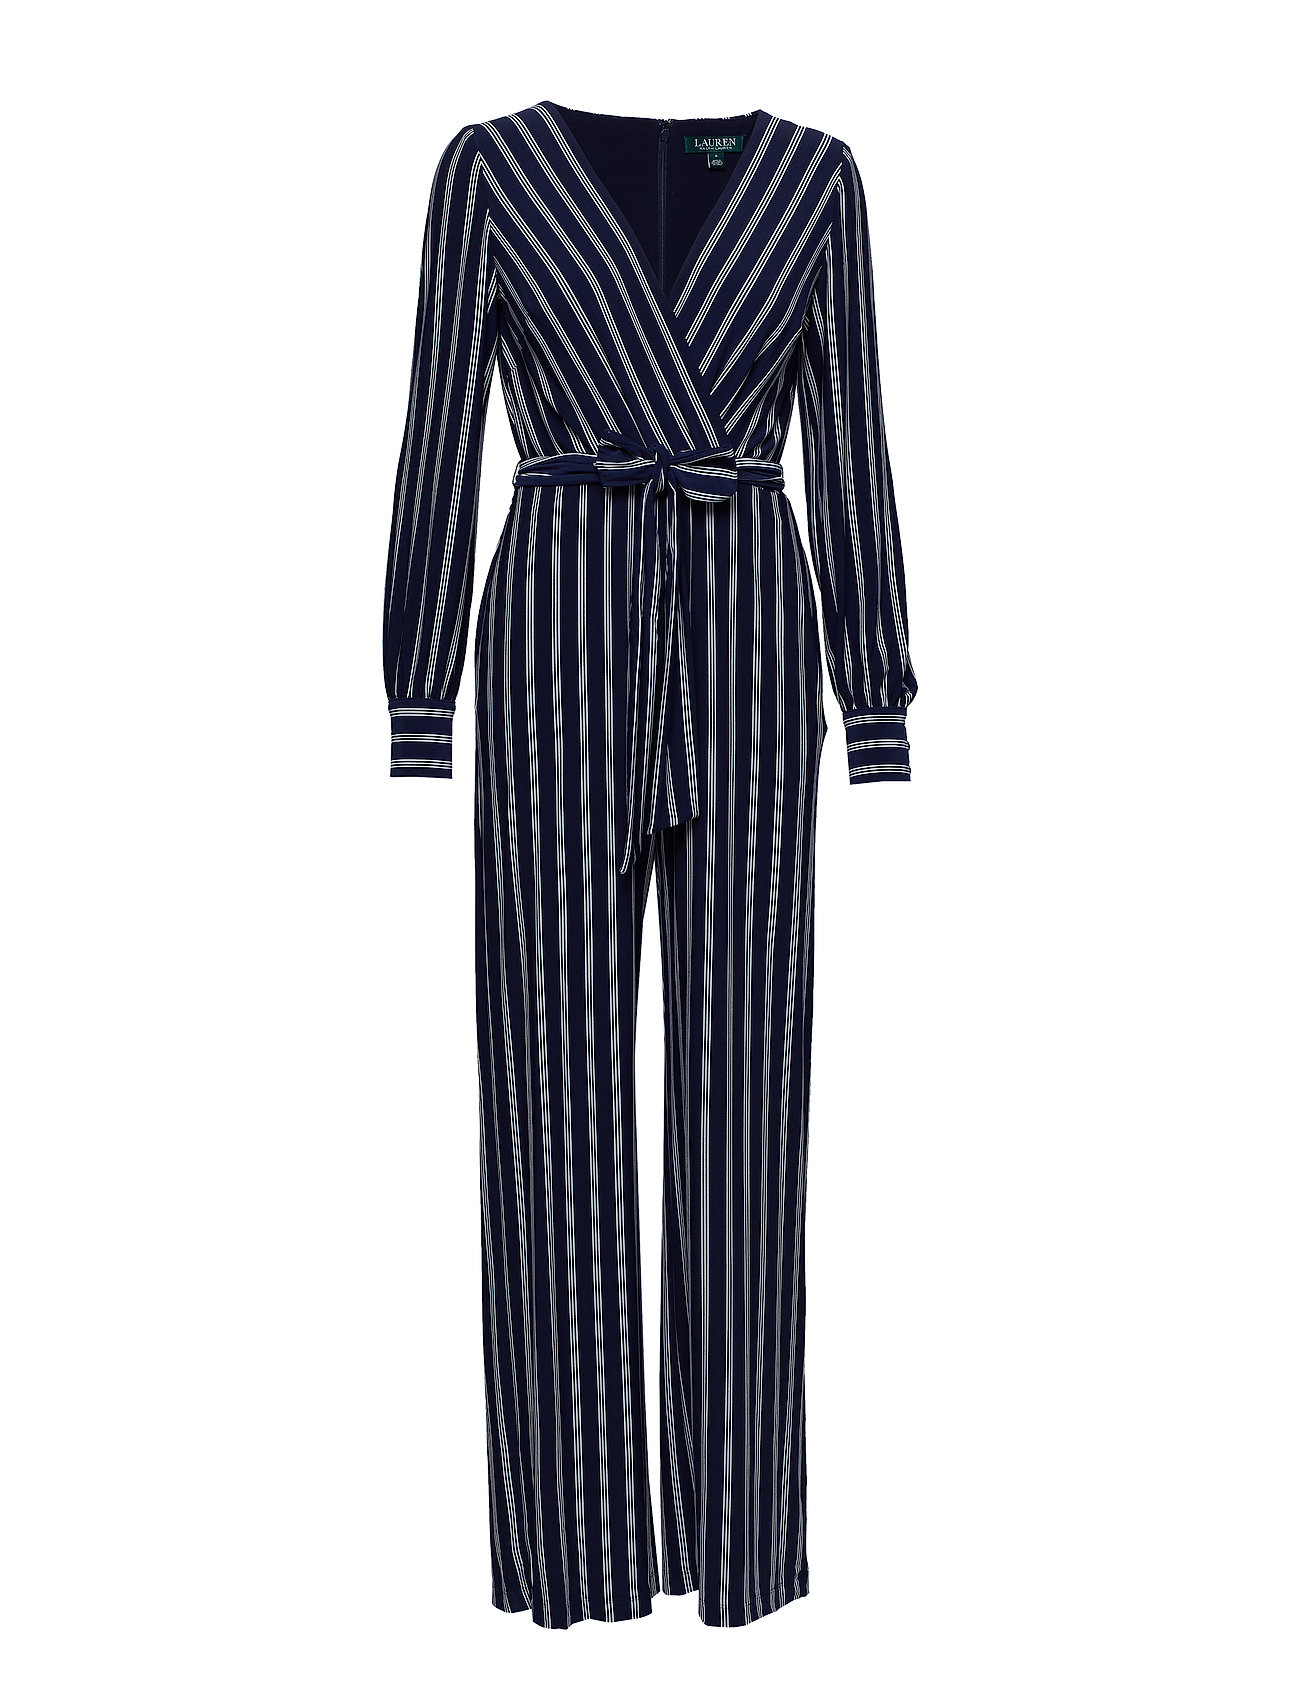 d3ed13e002ad Striped Jersey Jumpsuit (Lighthouse Navy c) (£200) - Lauren Ralph ...